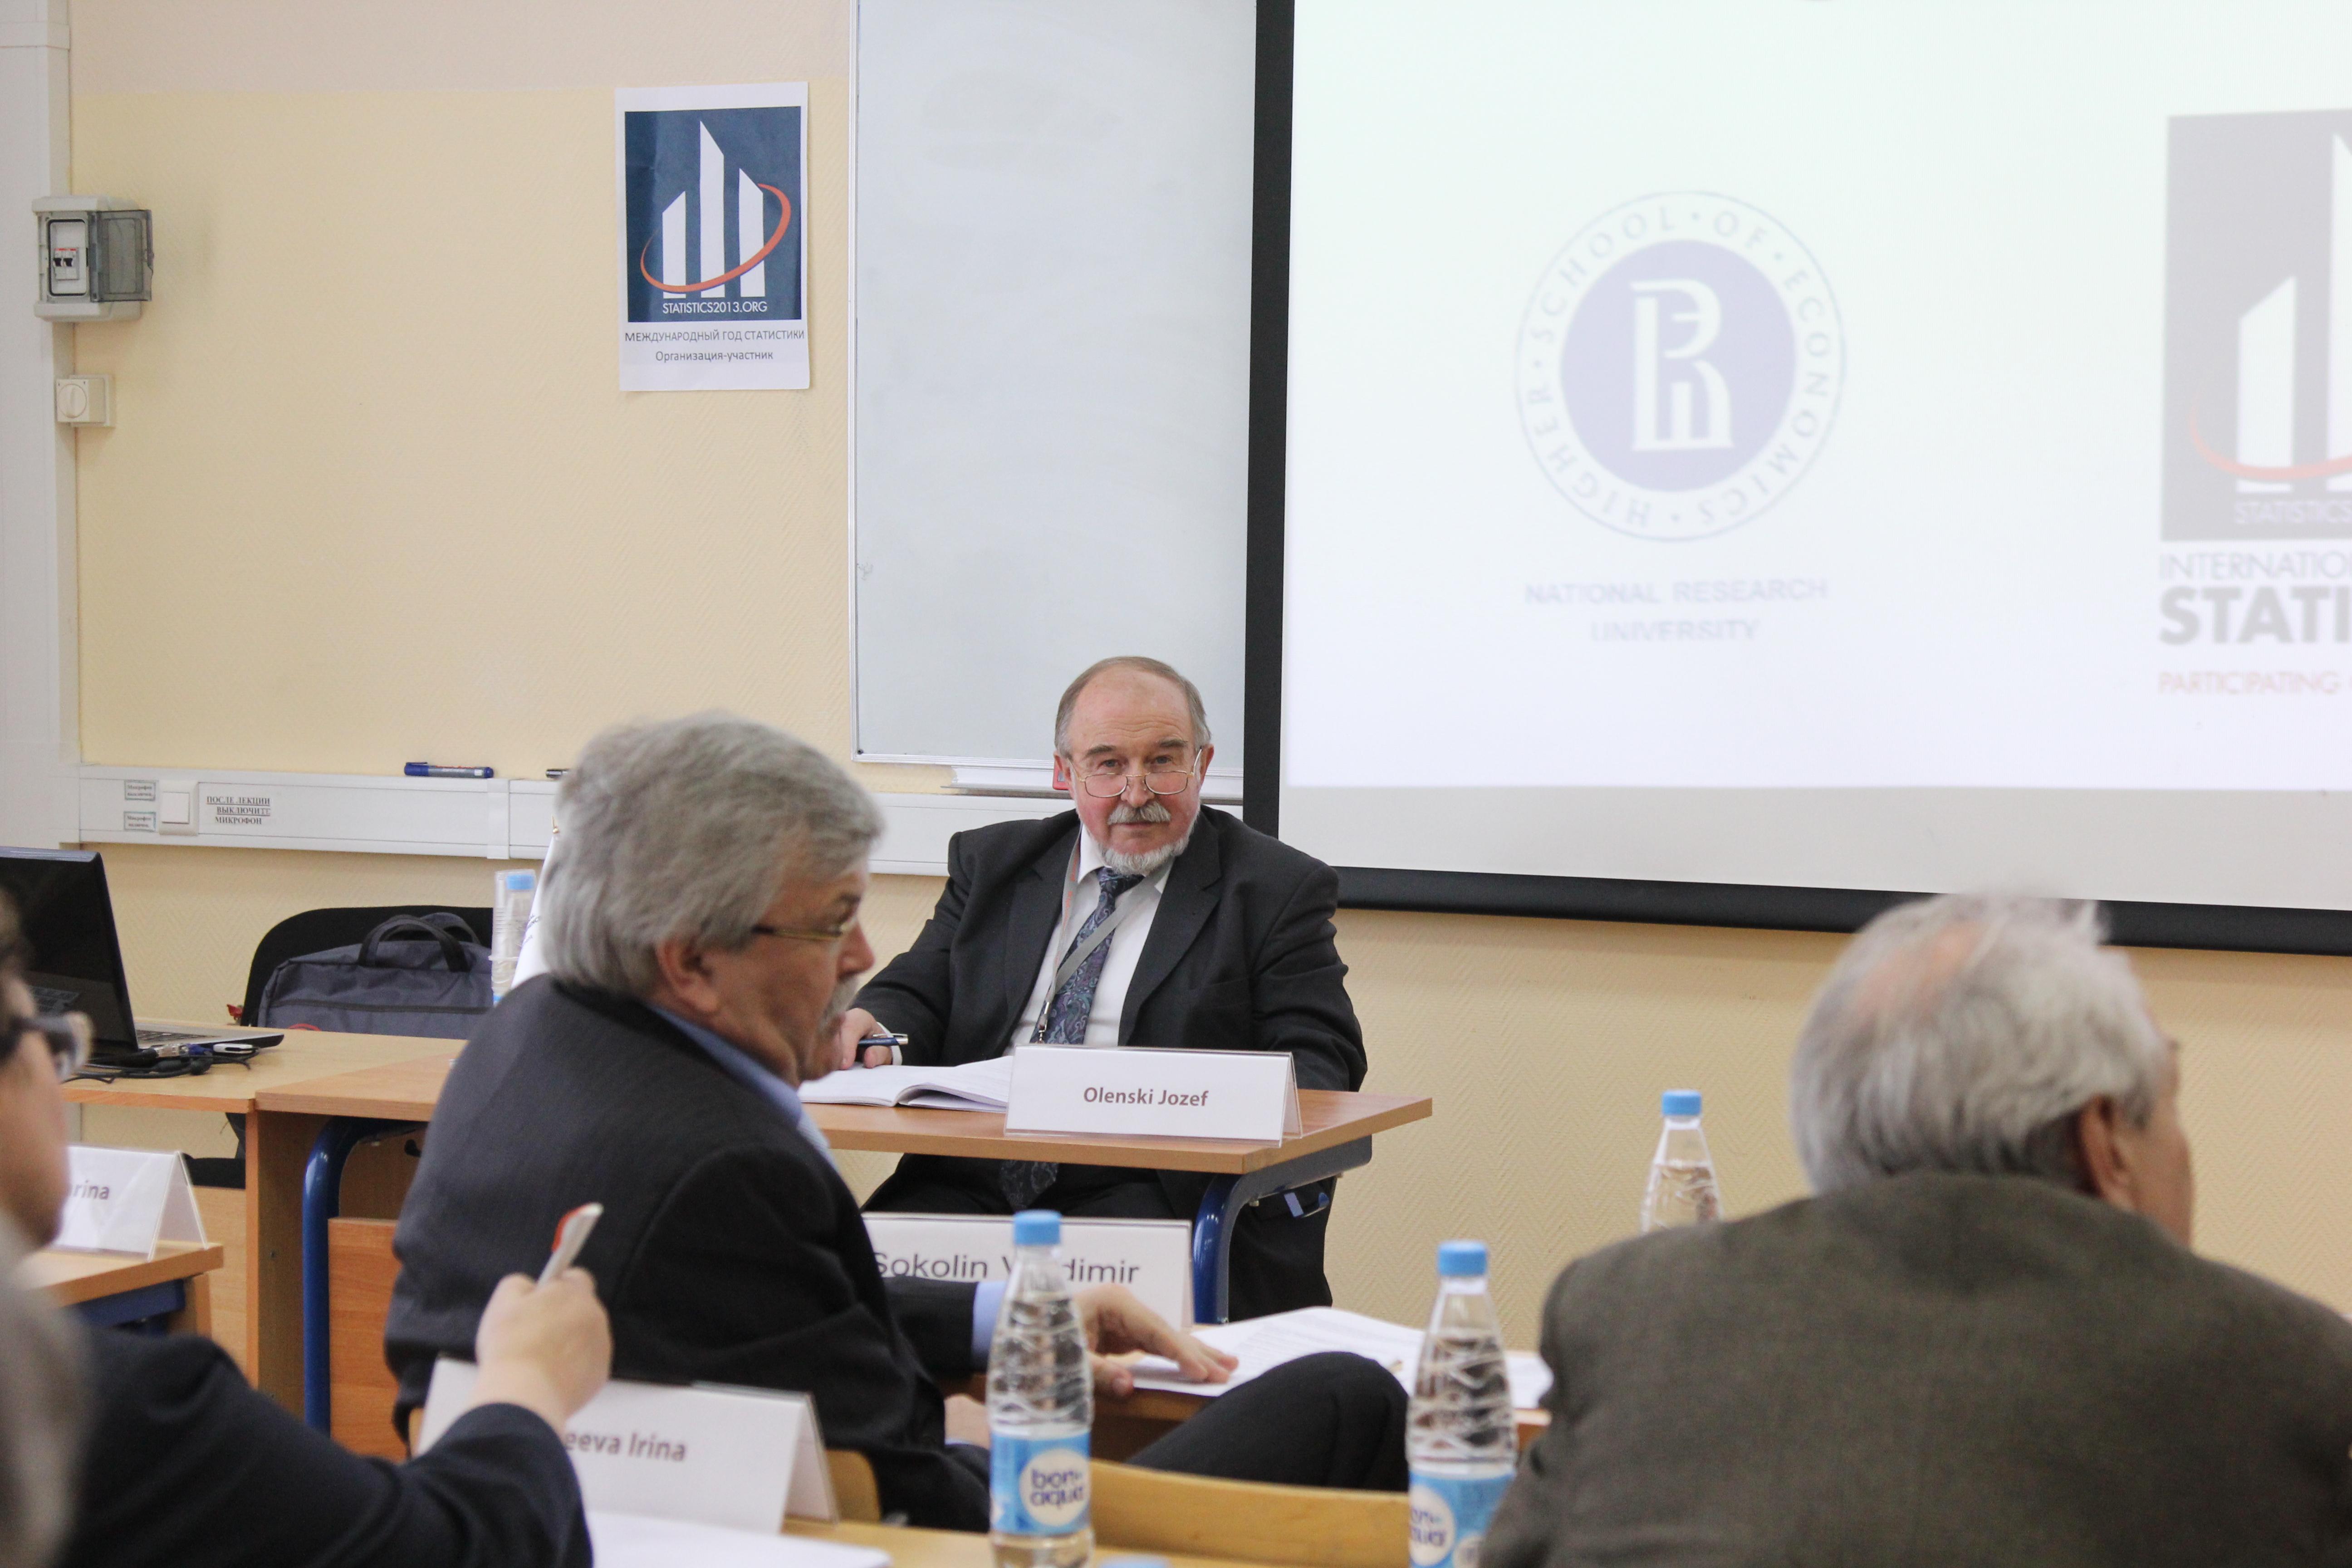 Xiv April International Academic Conference On Economic